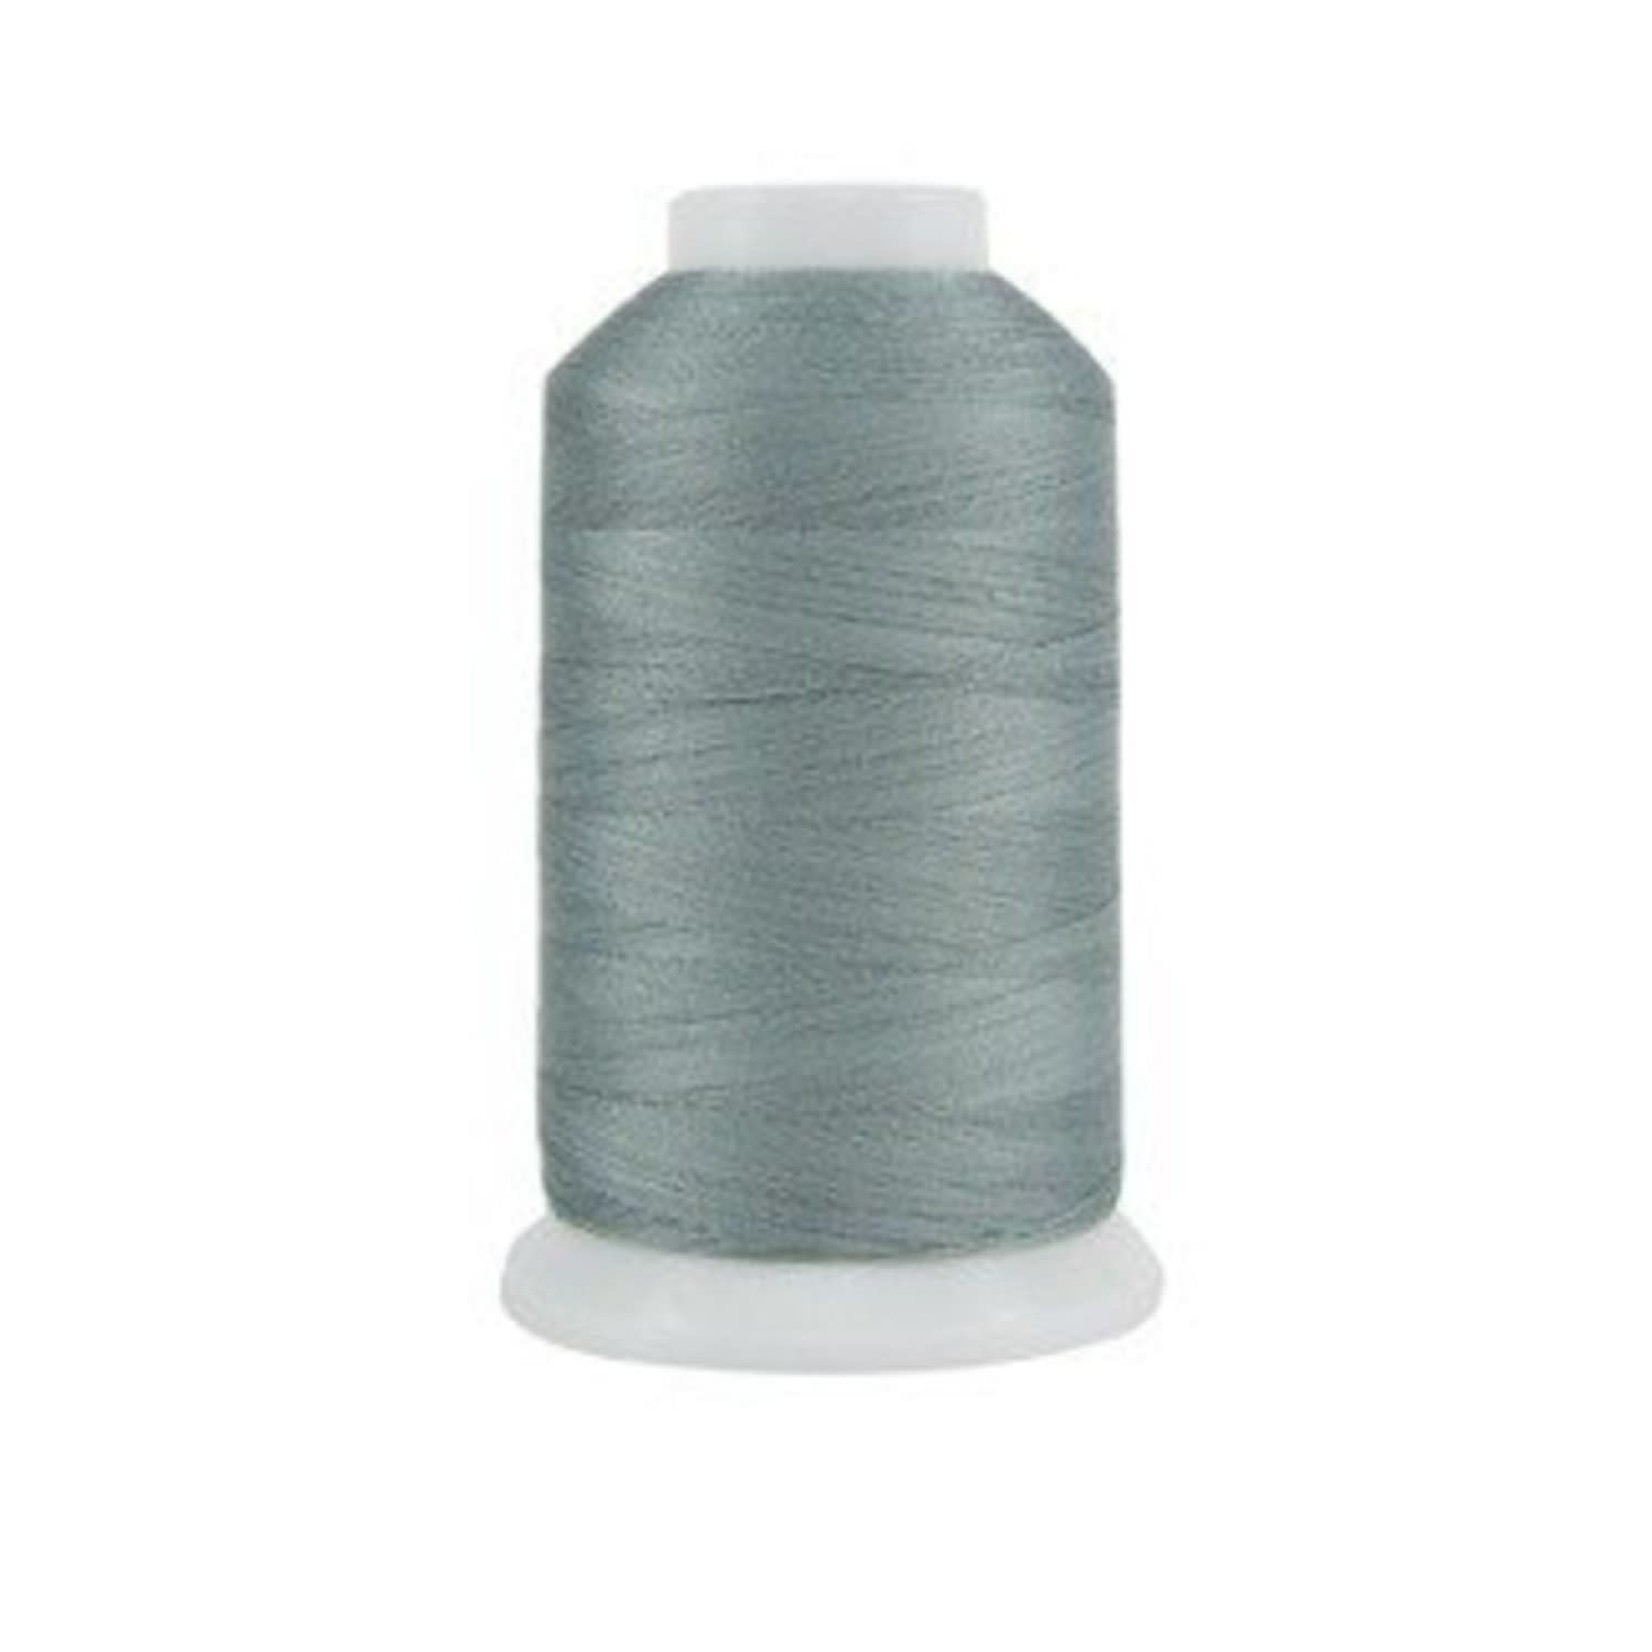 Superior Threads King Tut - #40 - 1828 m - 1025 Rainy Days